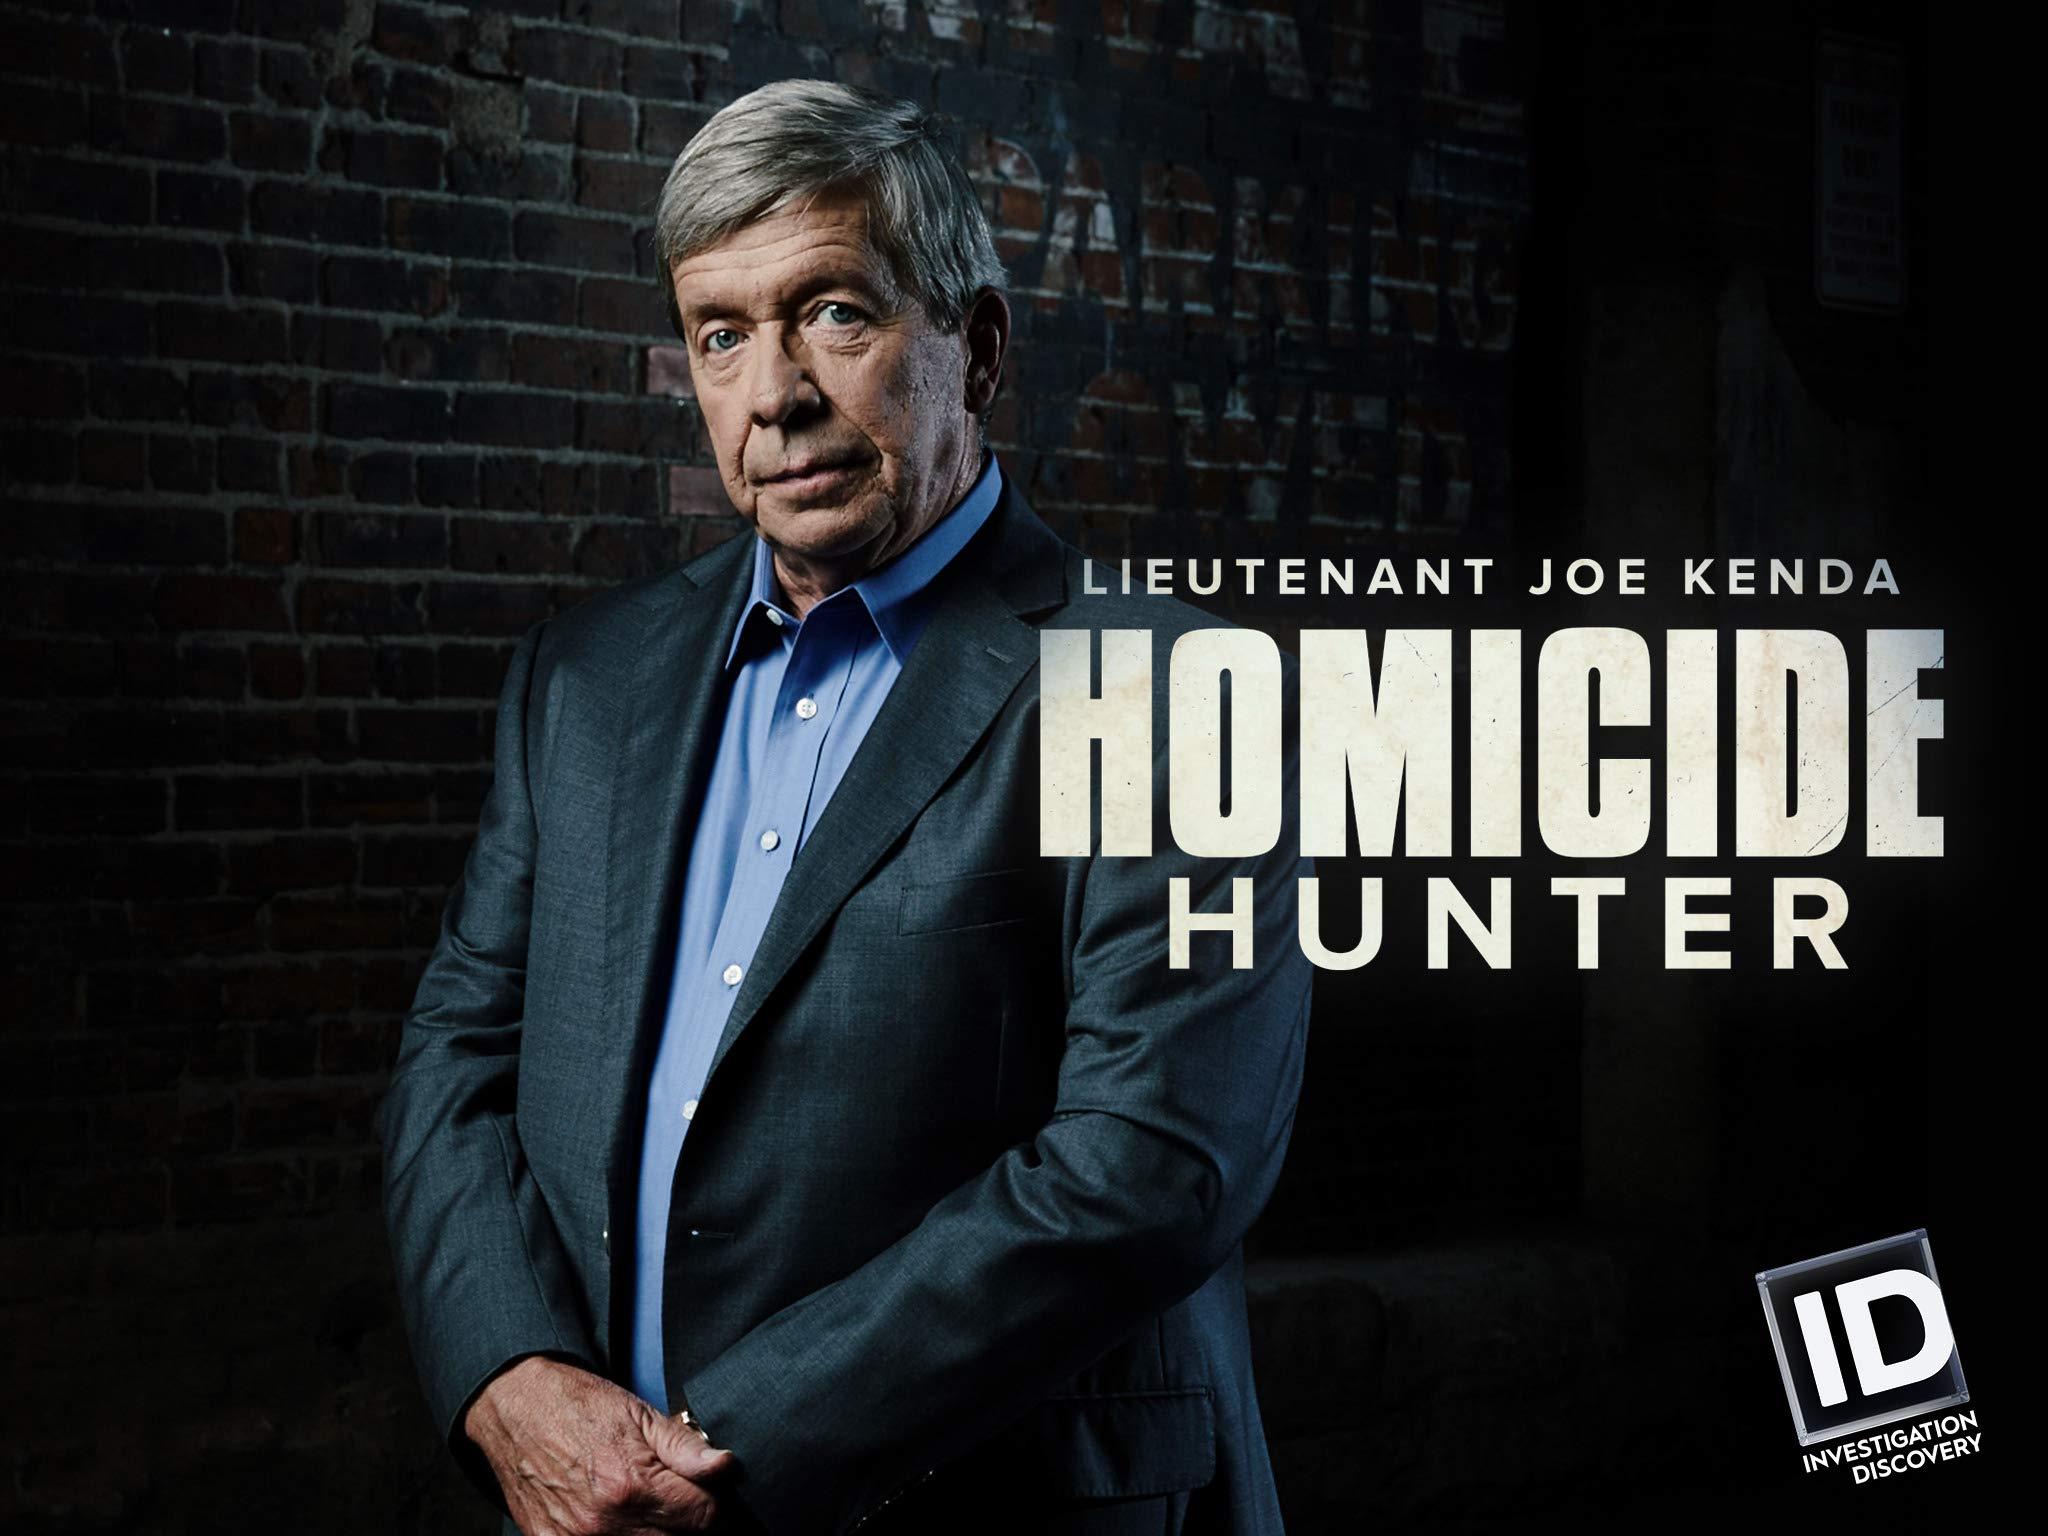 Watch Homicide Hunter: Lt. Joe Kenda Season 8 | Prime Video